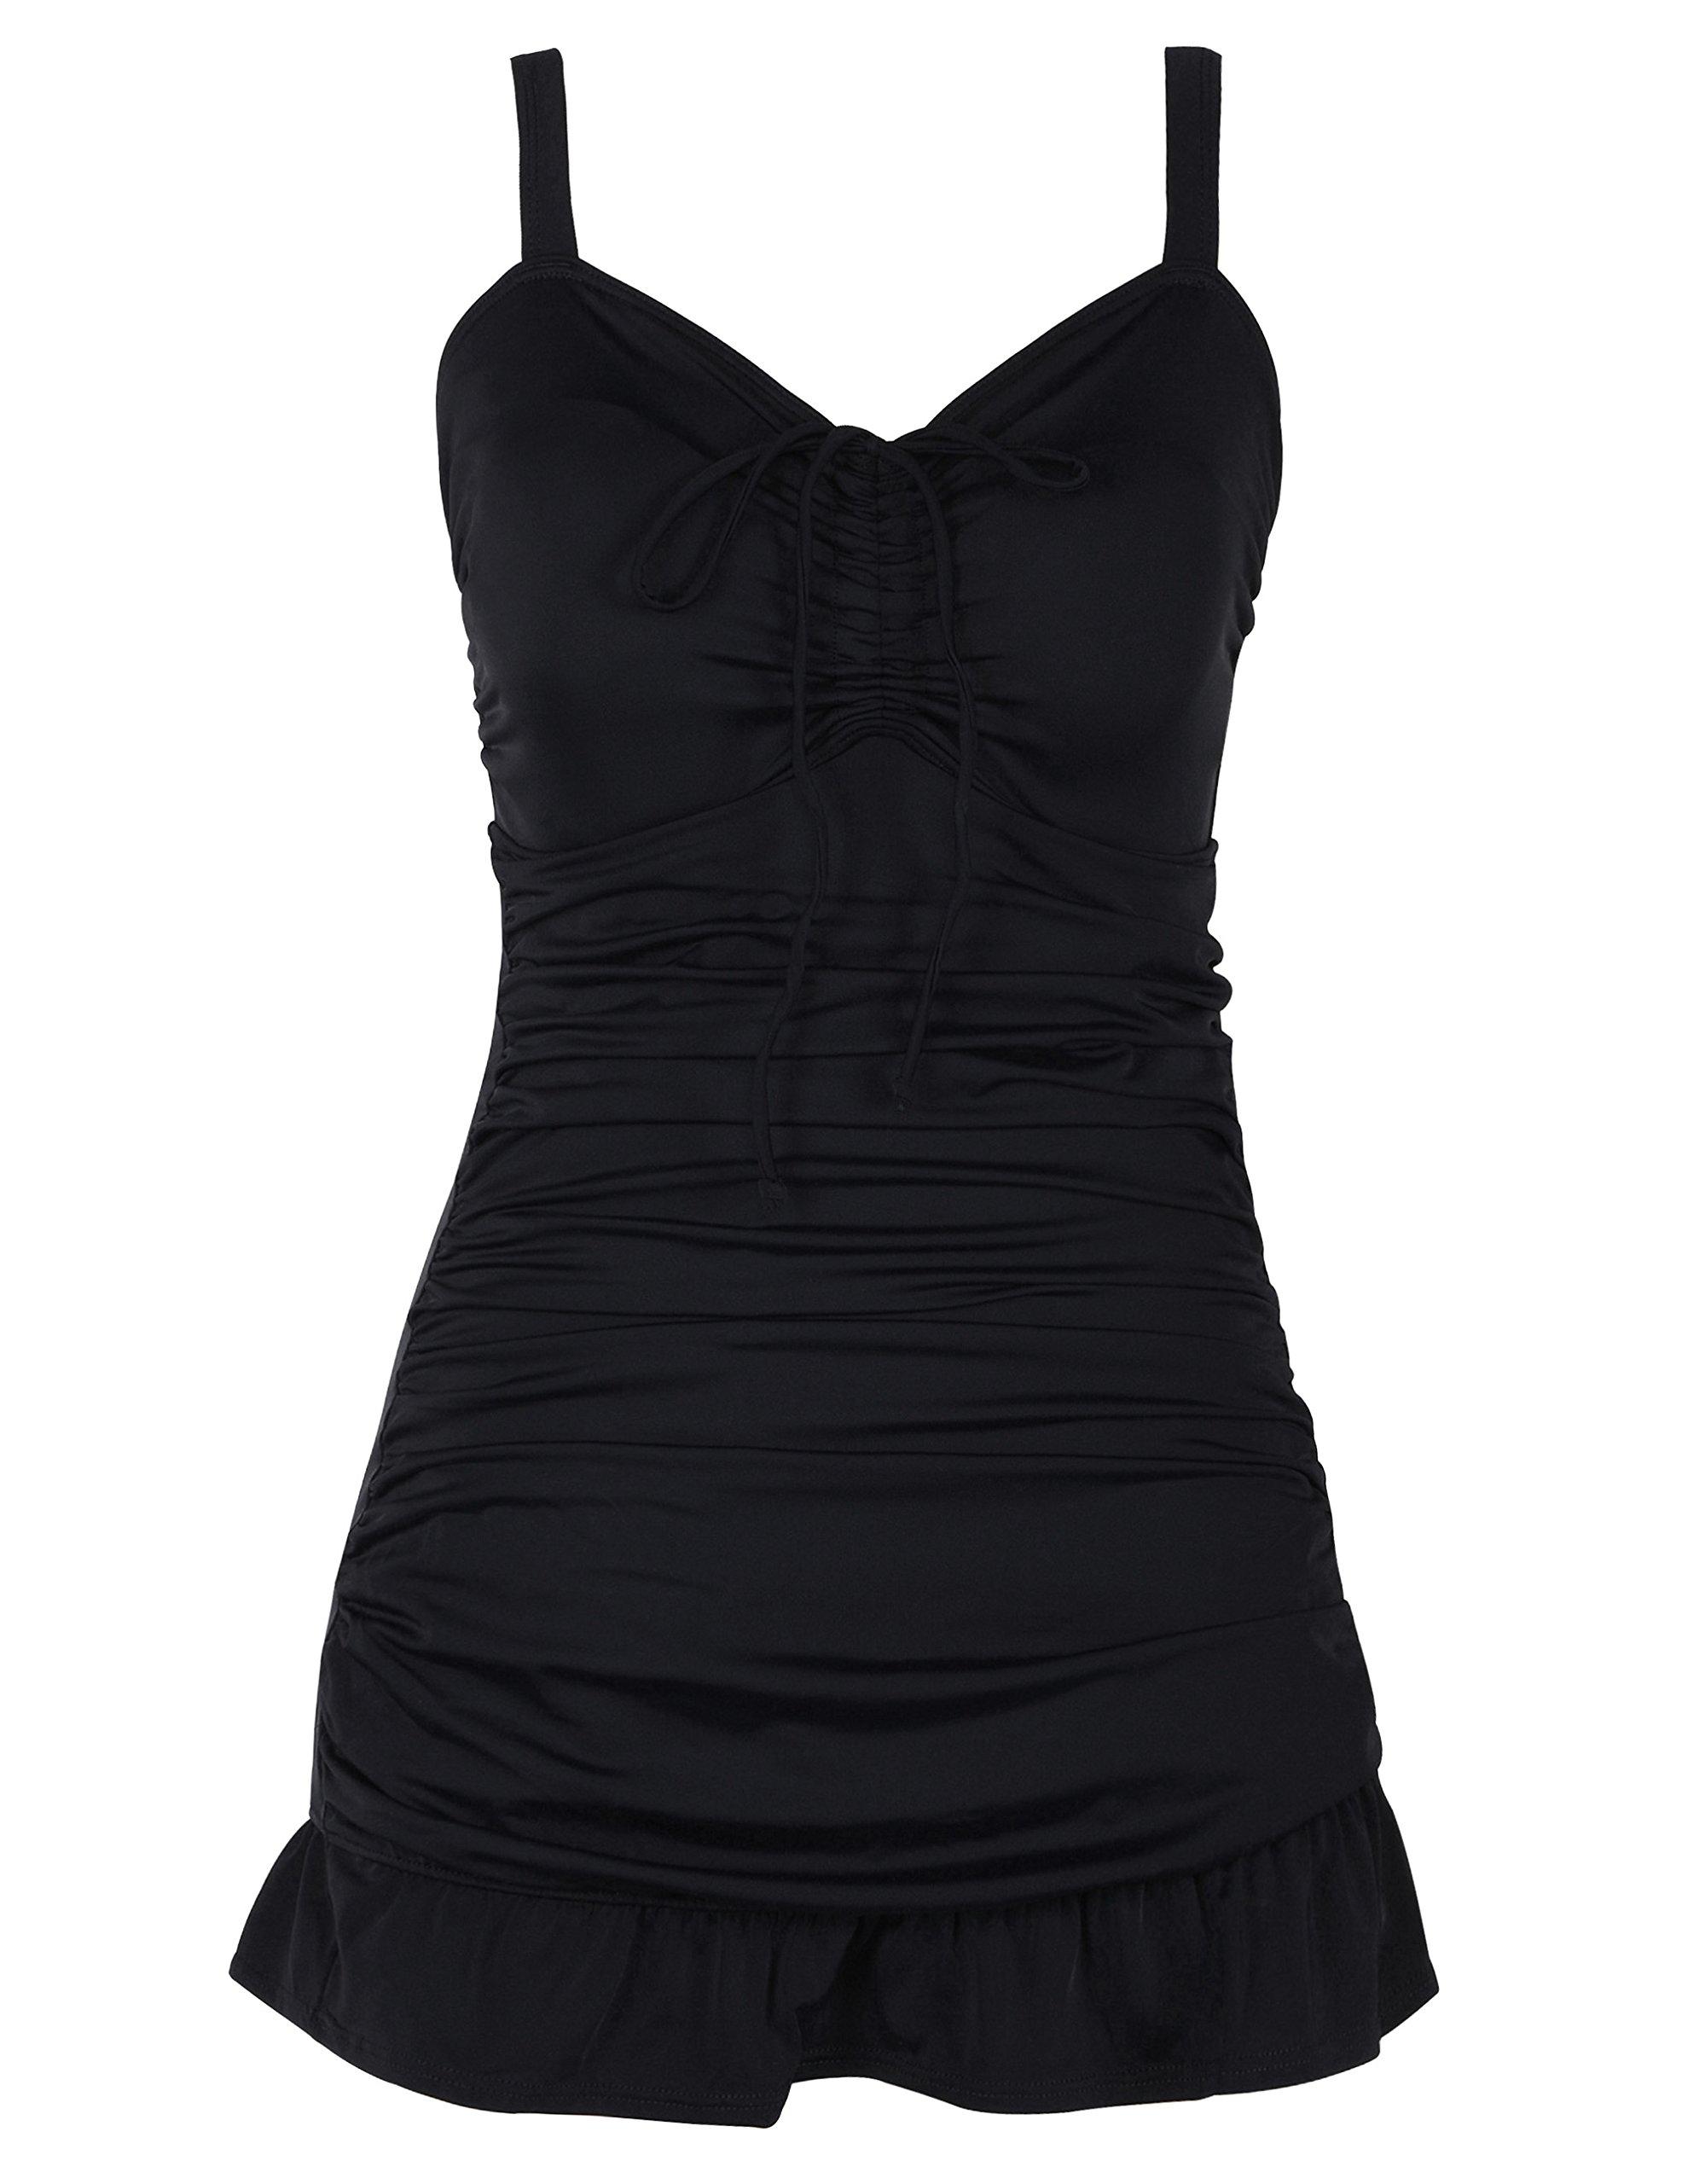 Septangle Women's One Piece Polka Dot Body Shaping Ruffled Hem Swimdress (US 16, Black)